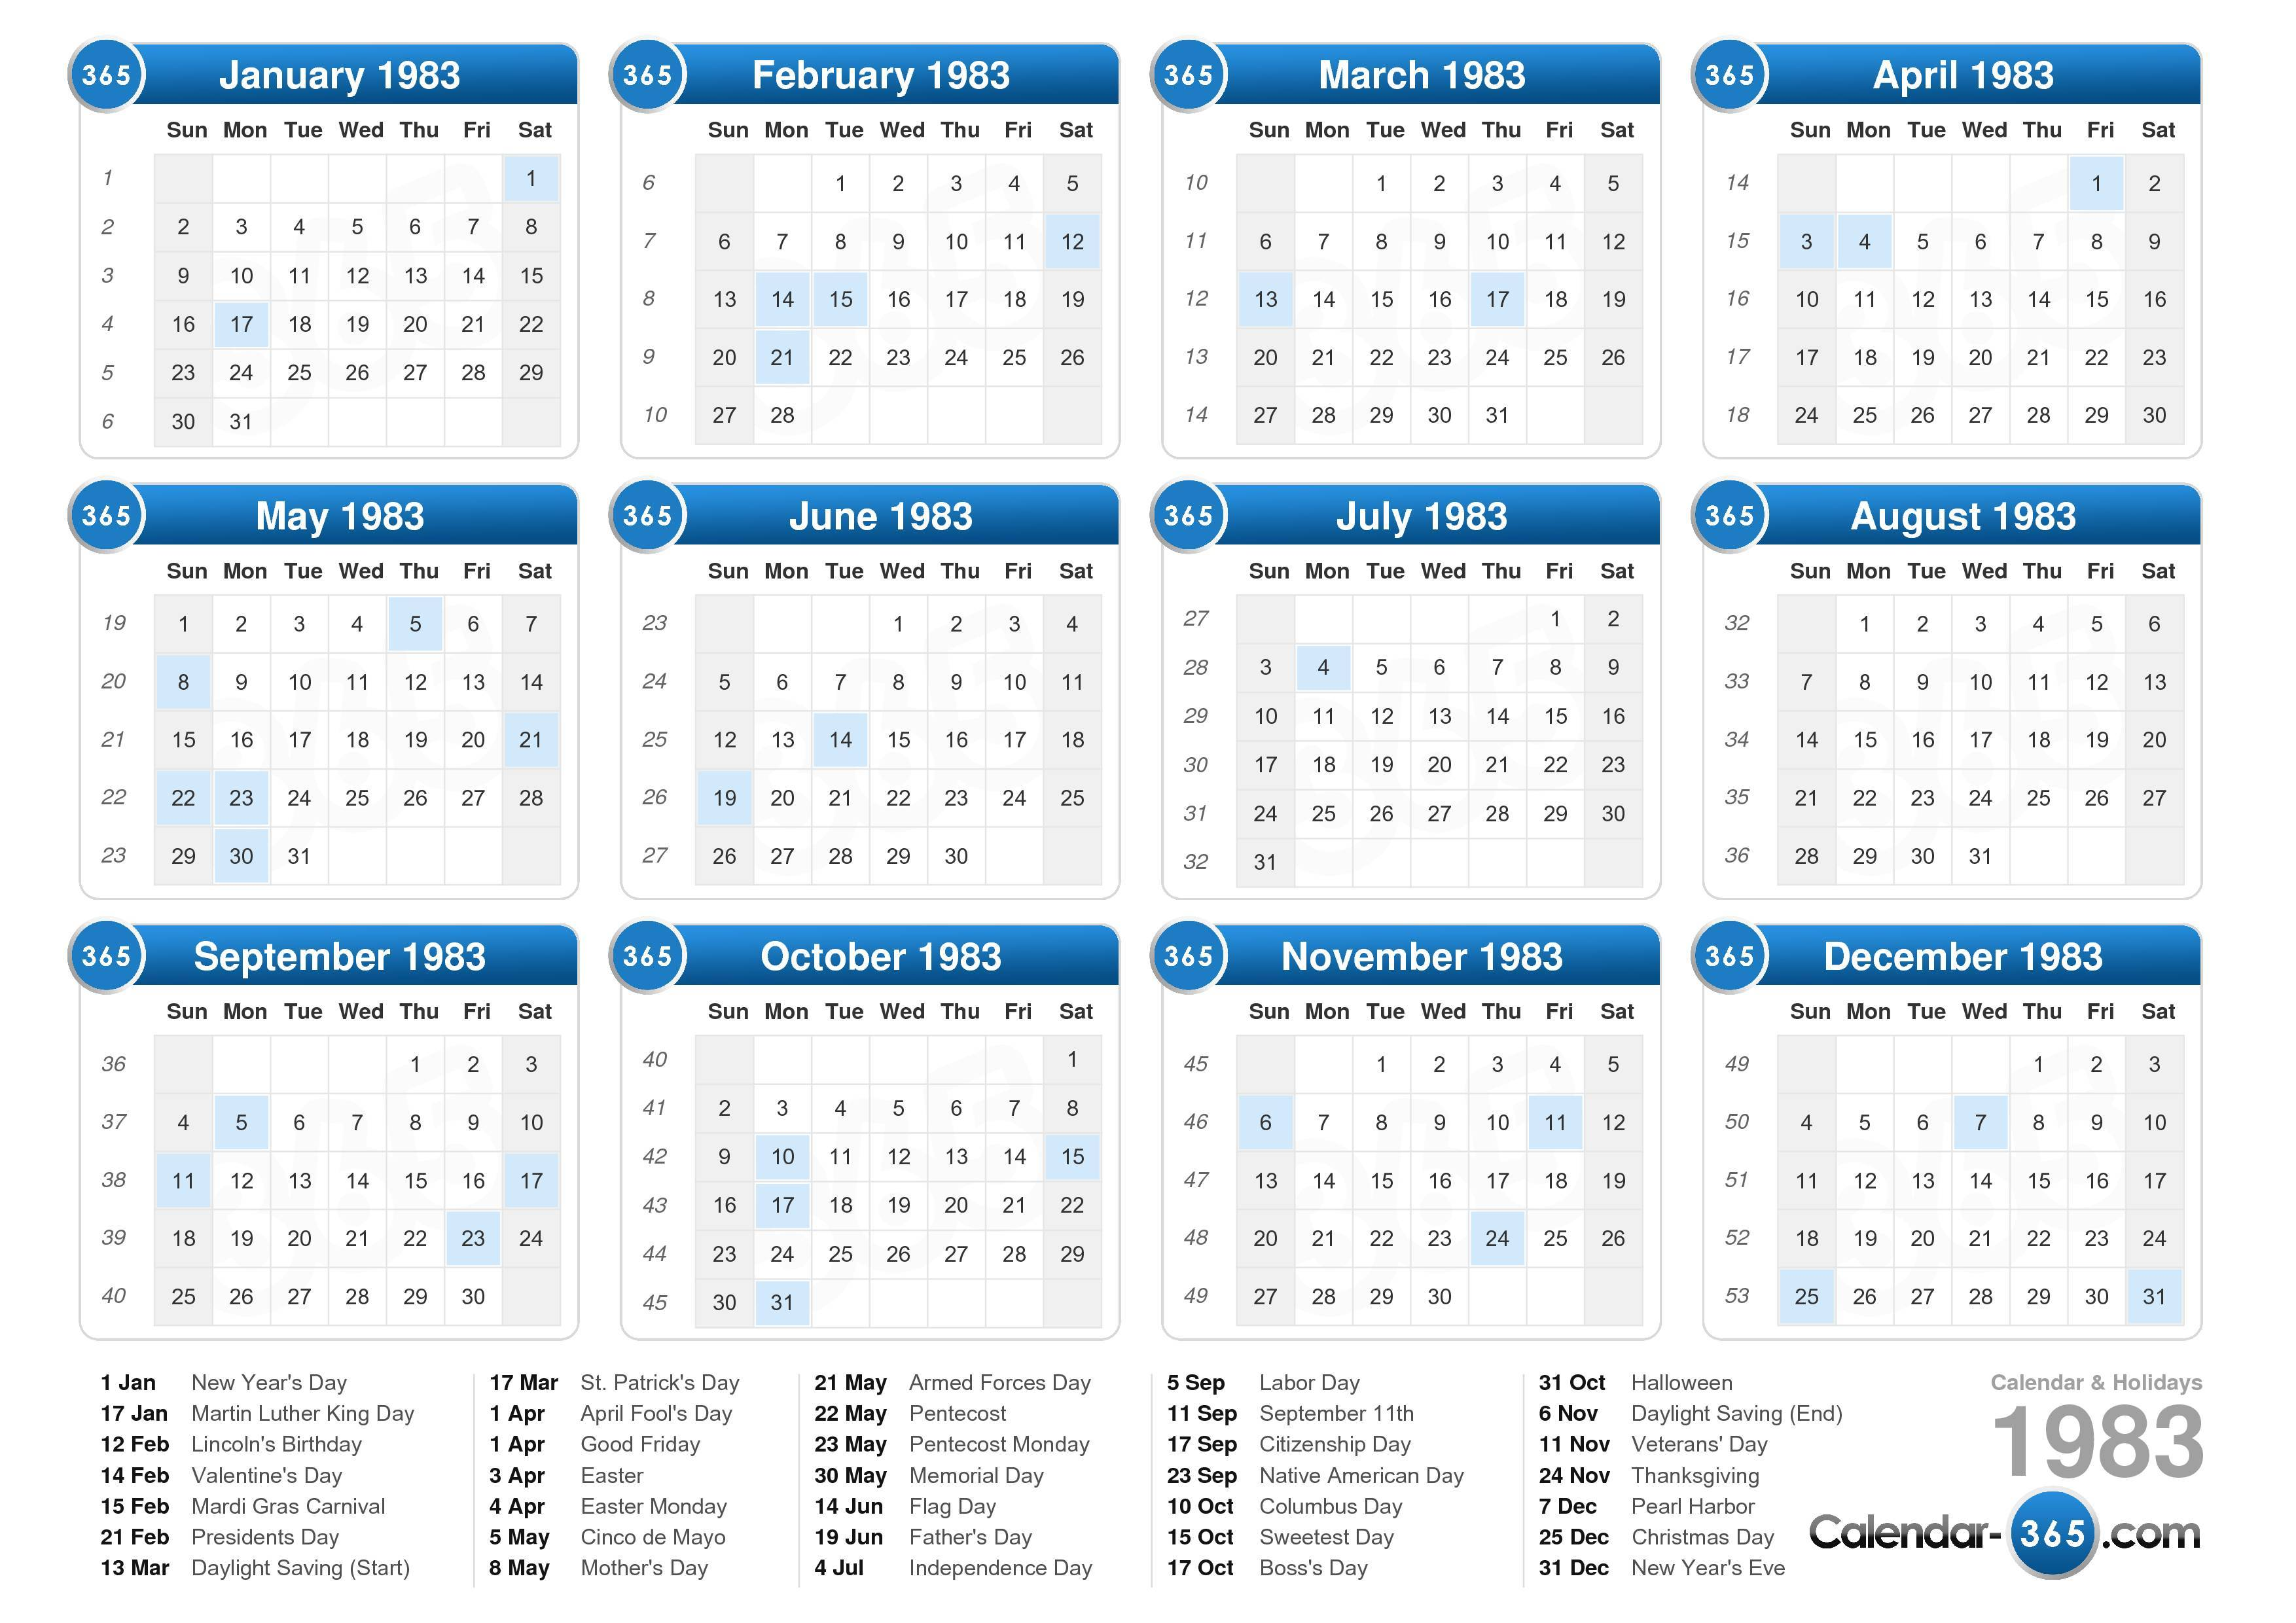 ... calendar with holidays landscape format 1 page 1983 calendar 395 16